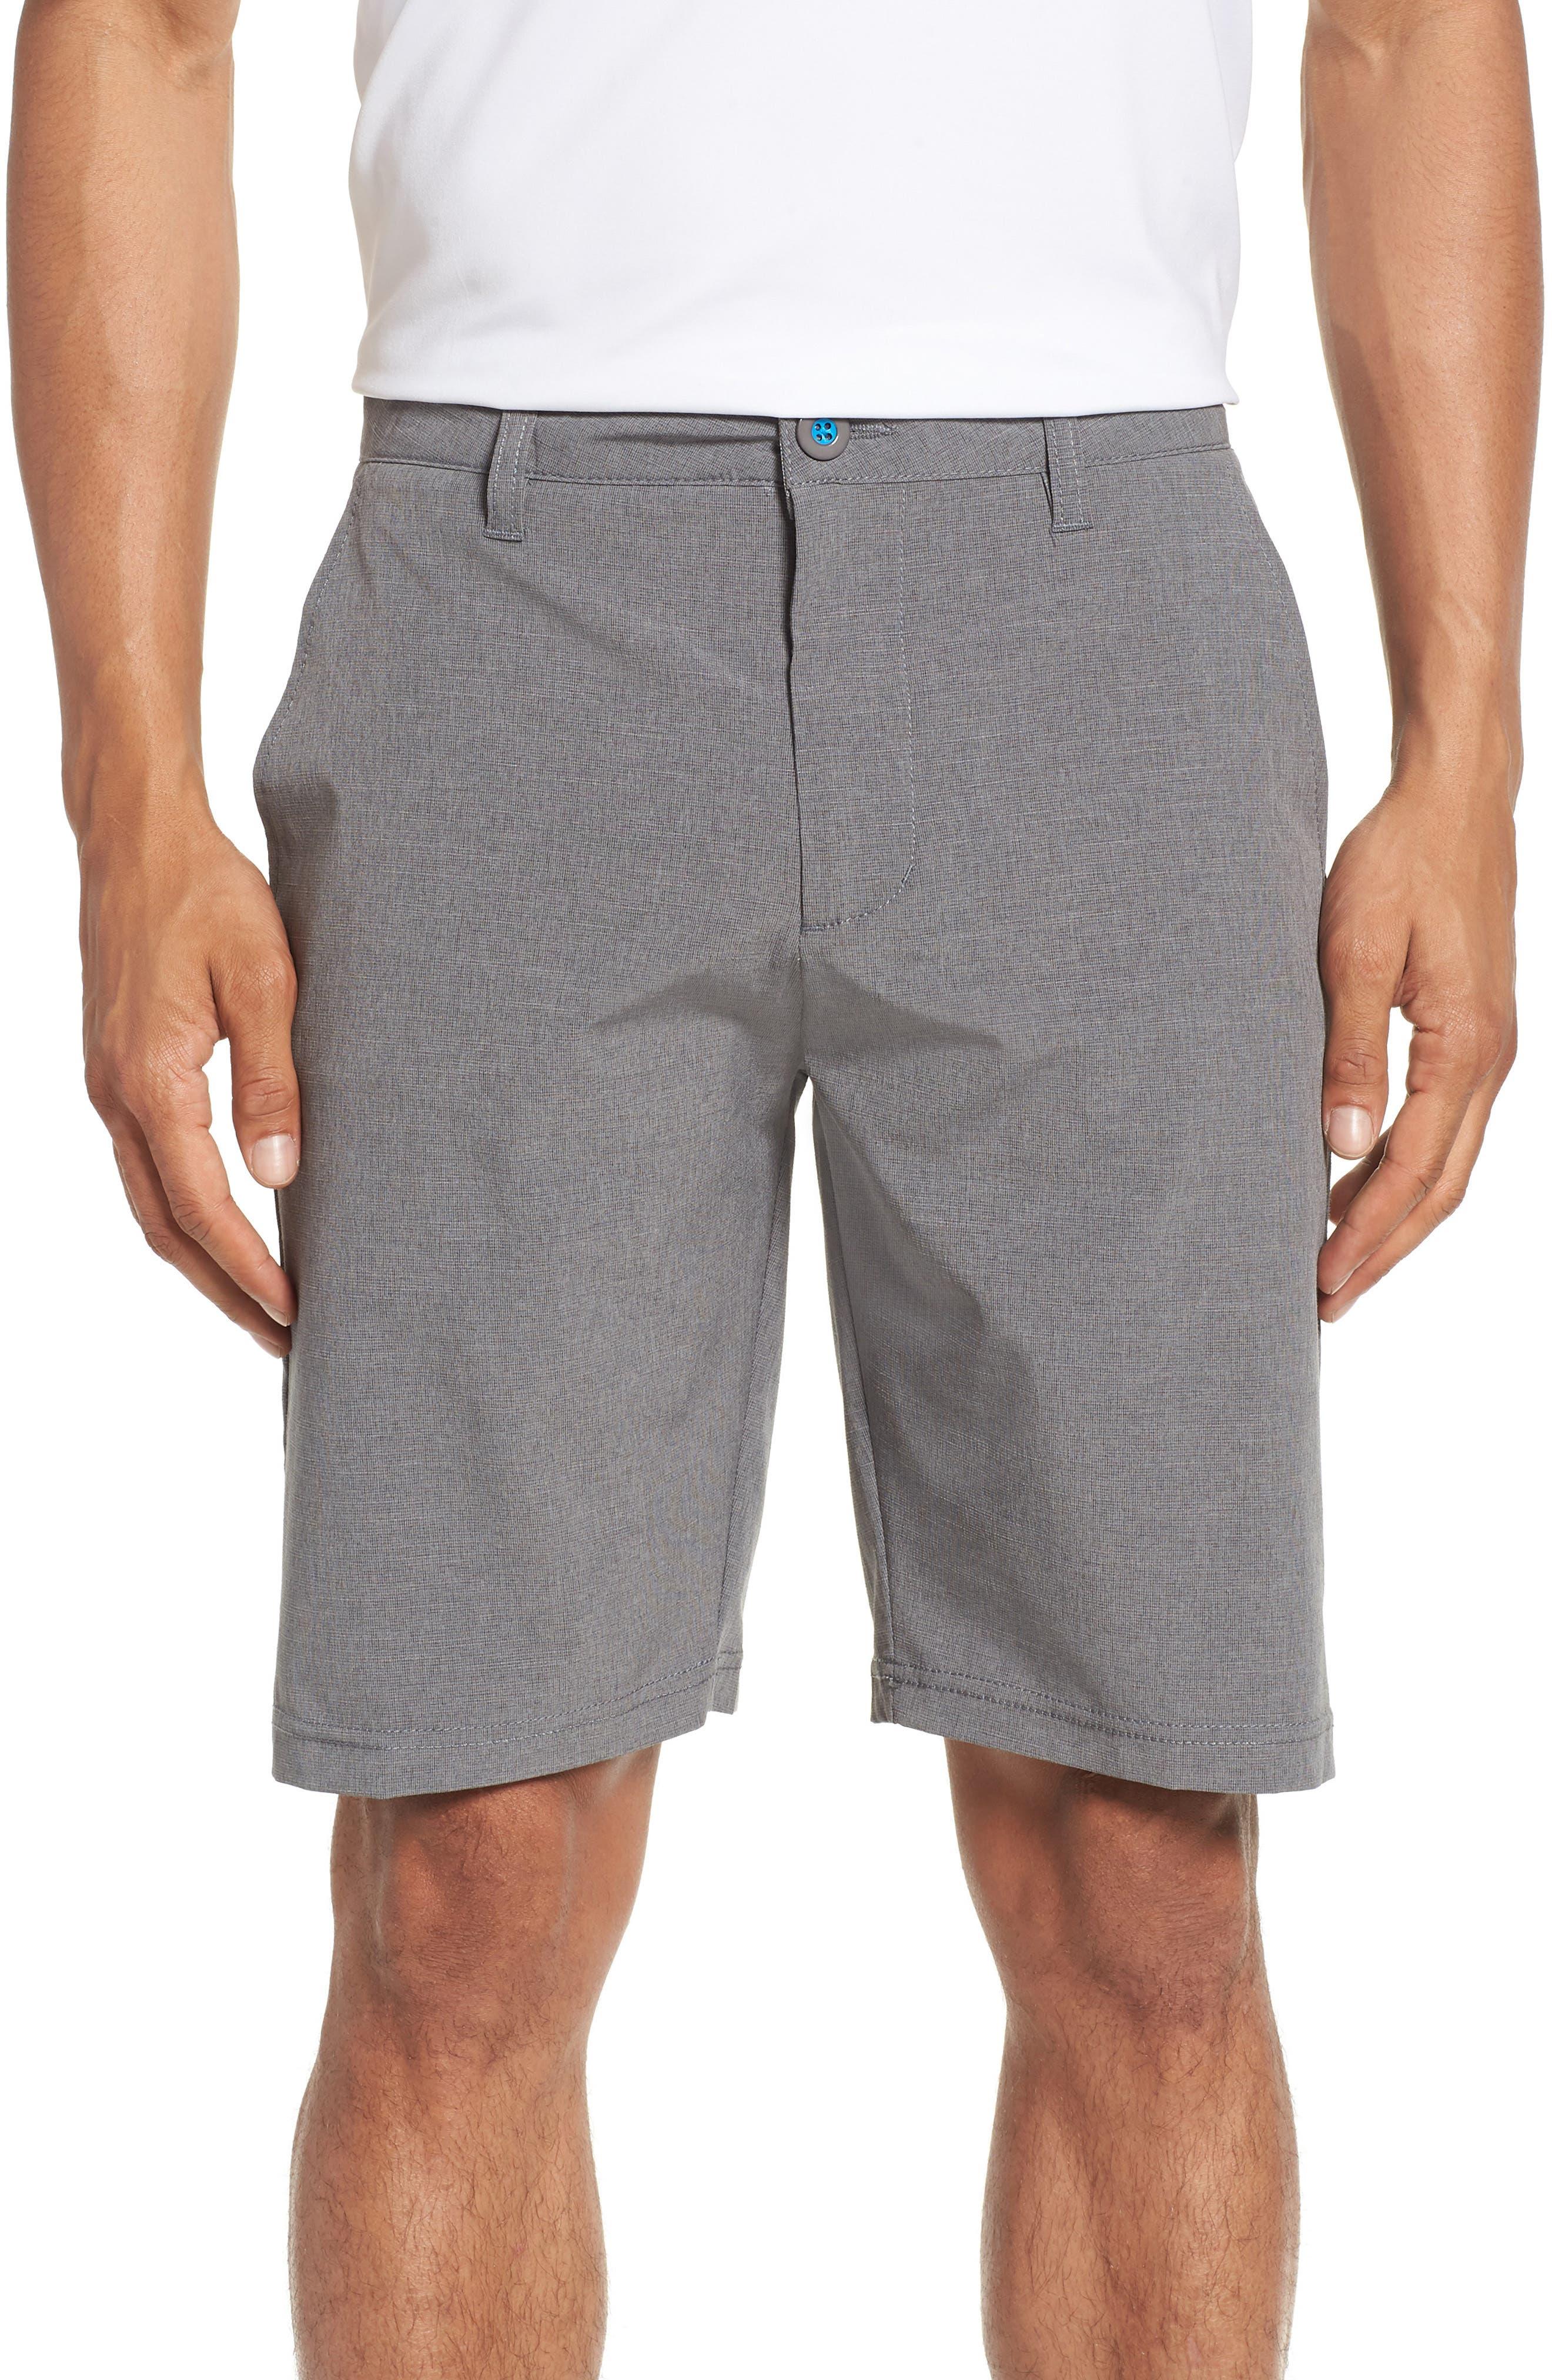 Cruiser Hybrid Shorts,                         Main,                         color, CHARCOAL